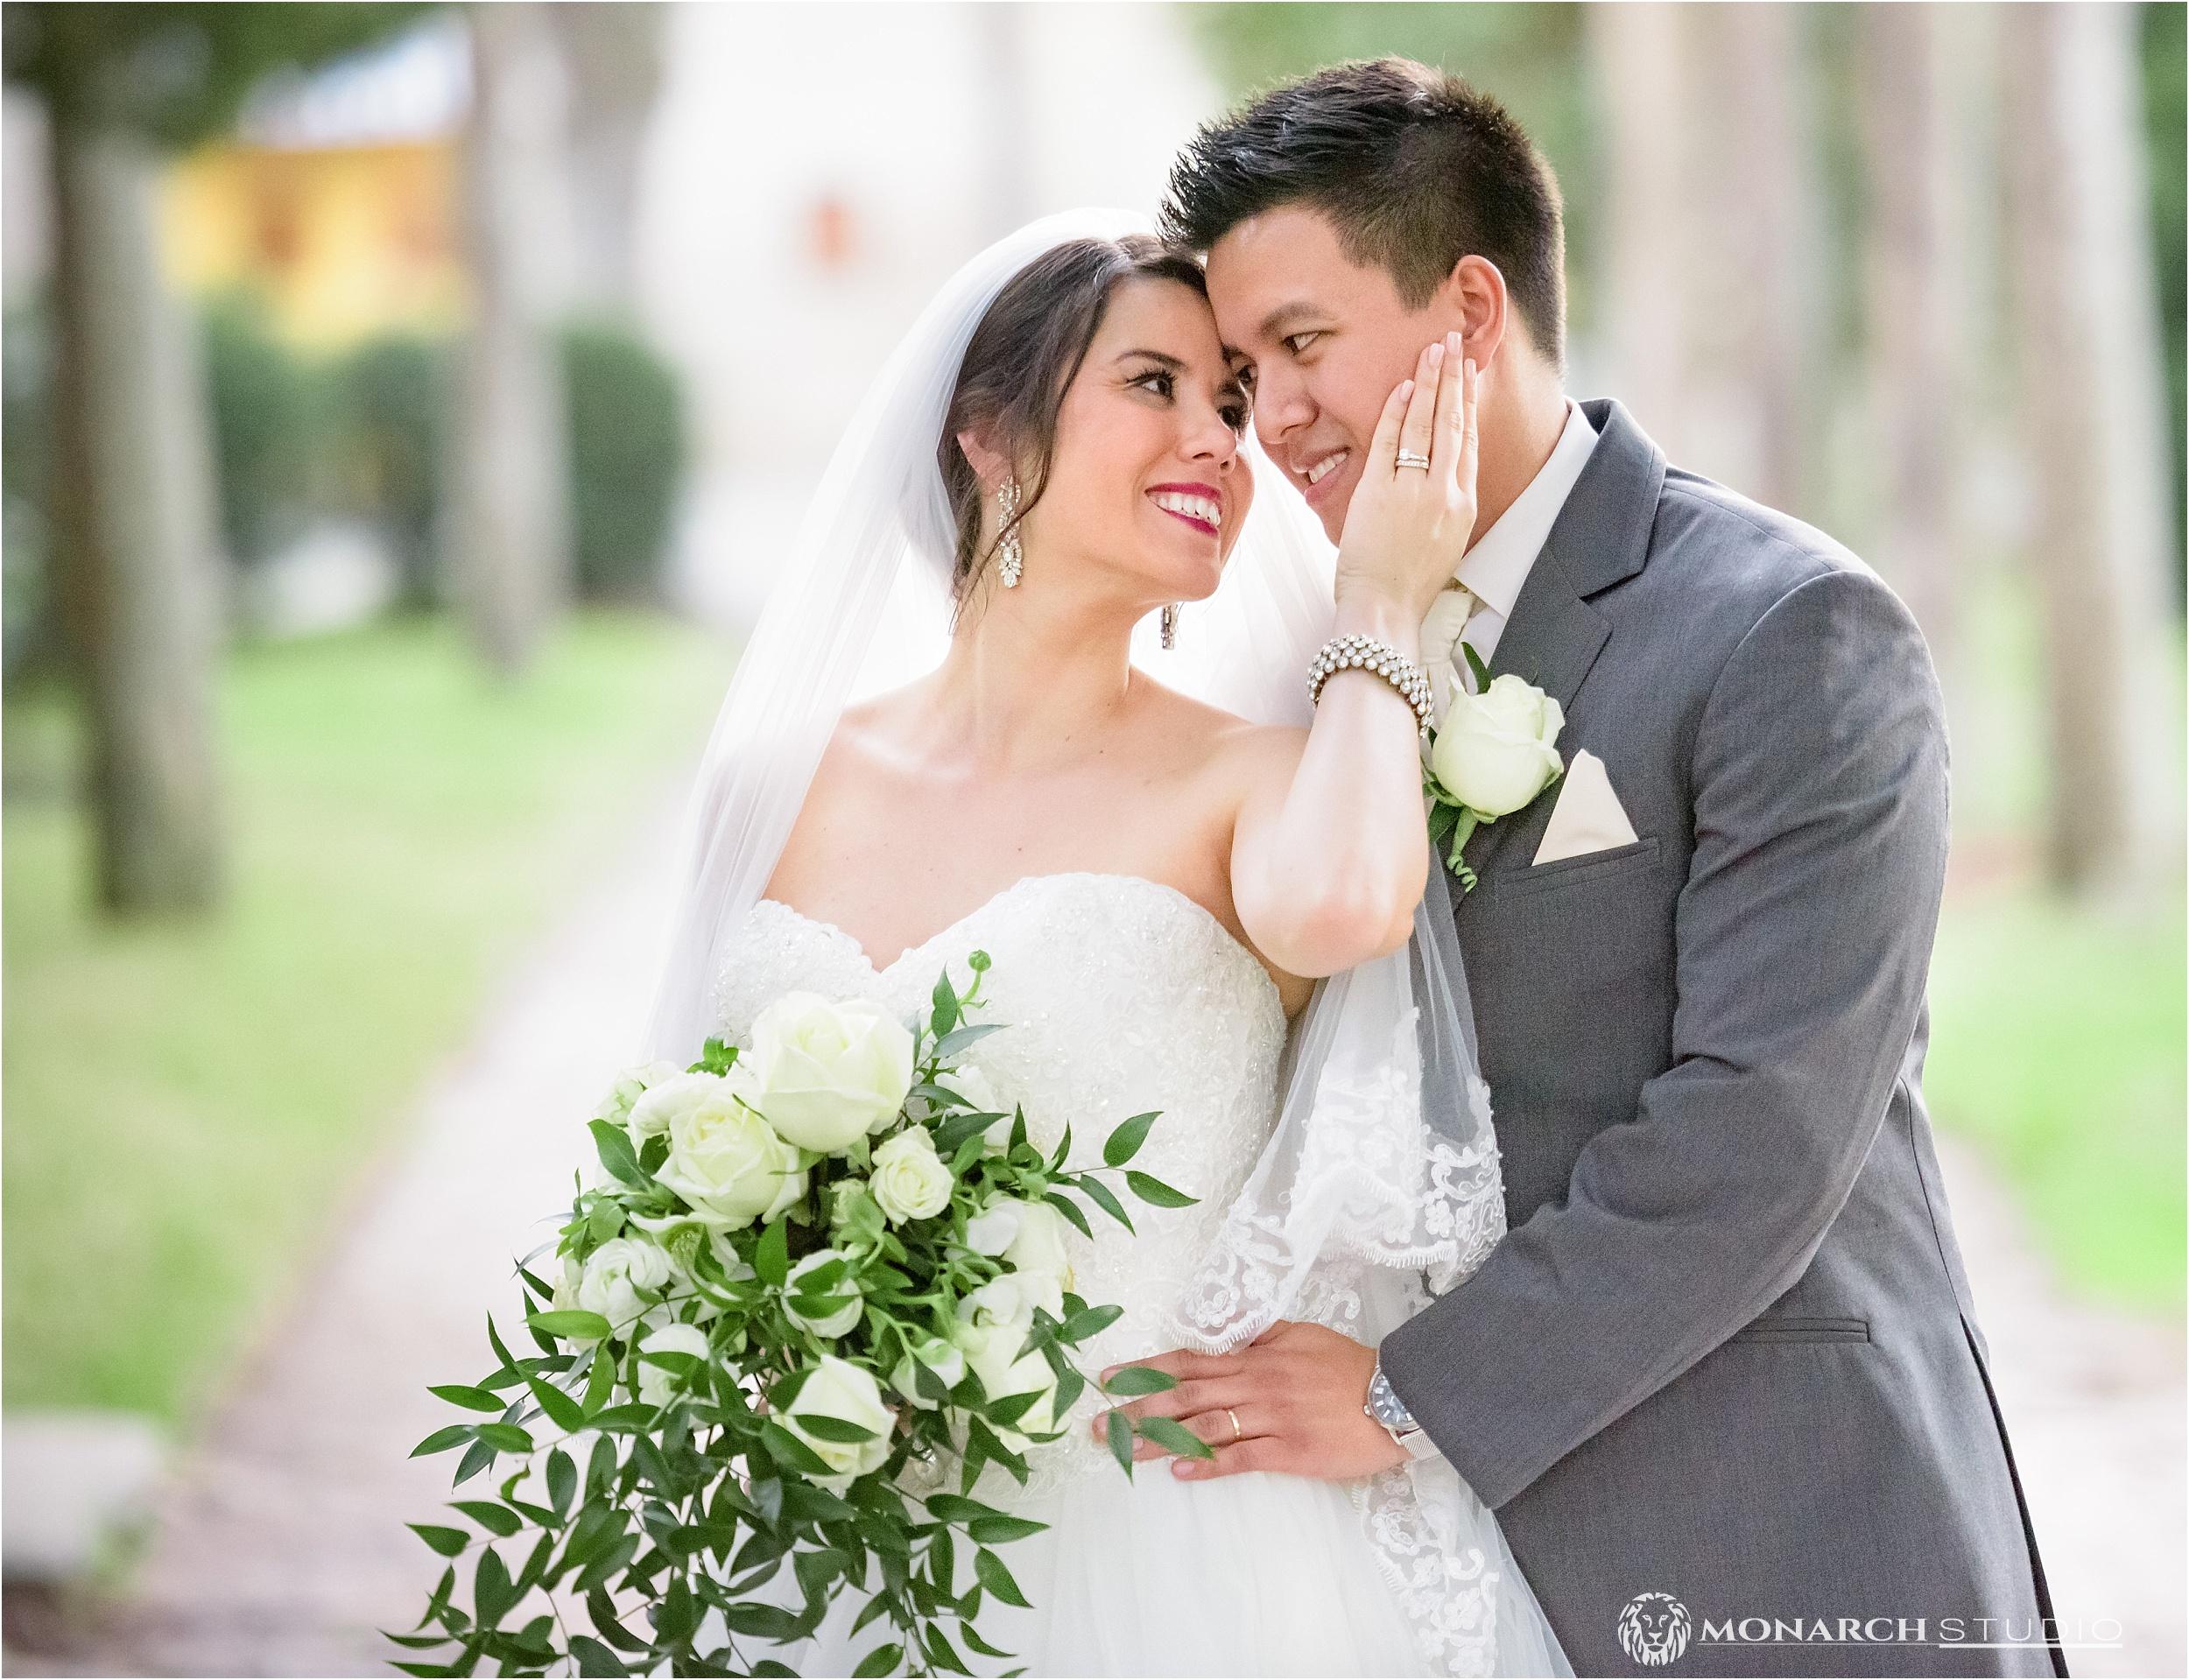 wedding-photographer-in-st-augustine-florida-treasury-073.jpg